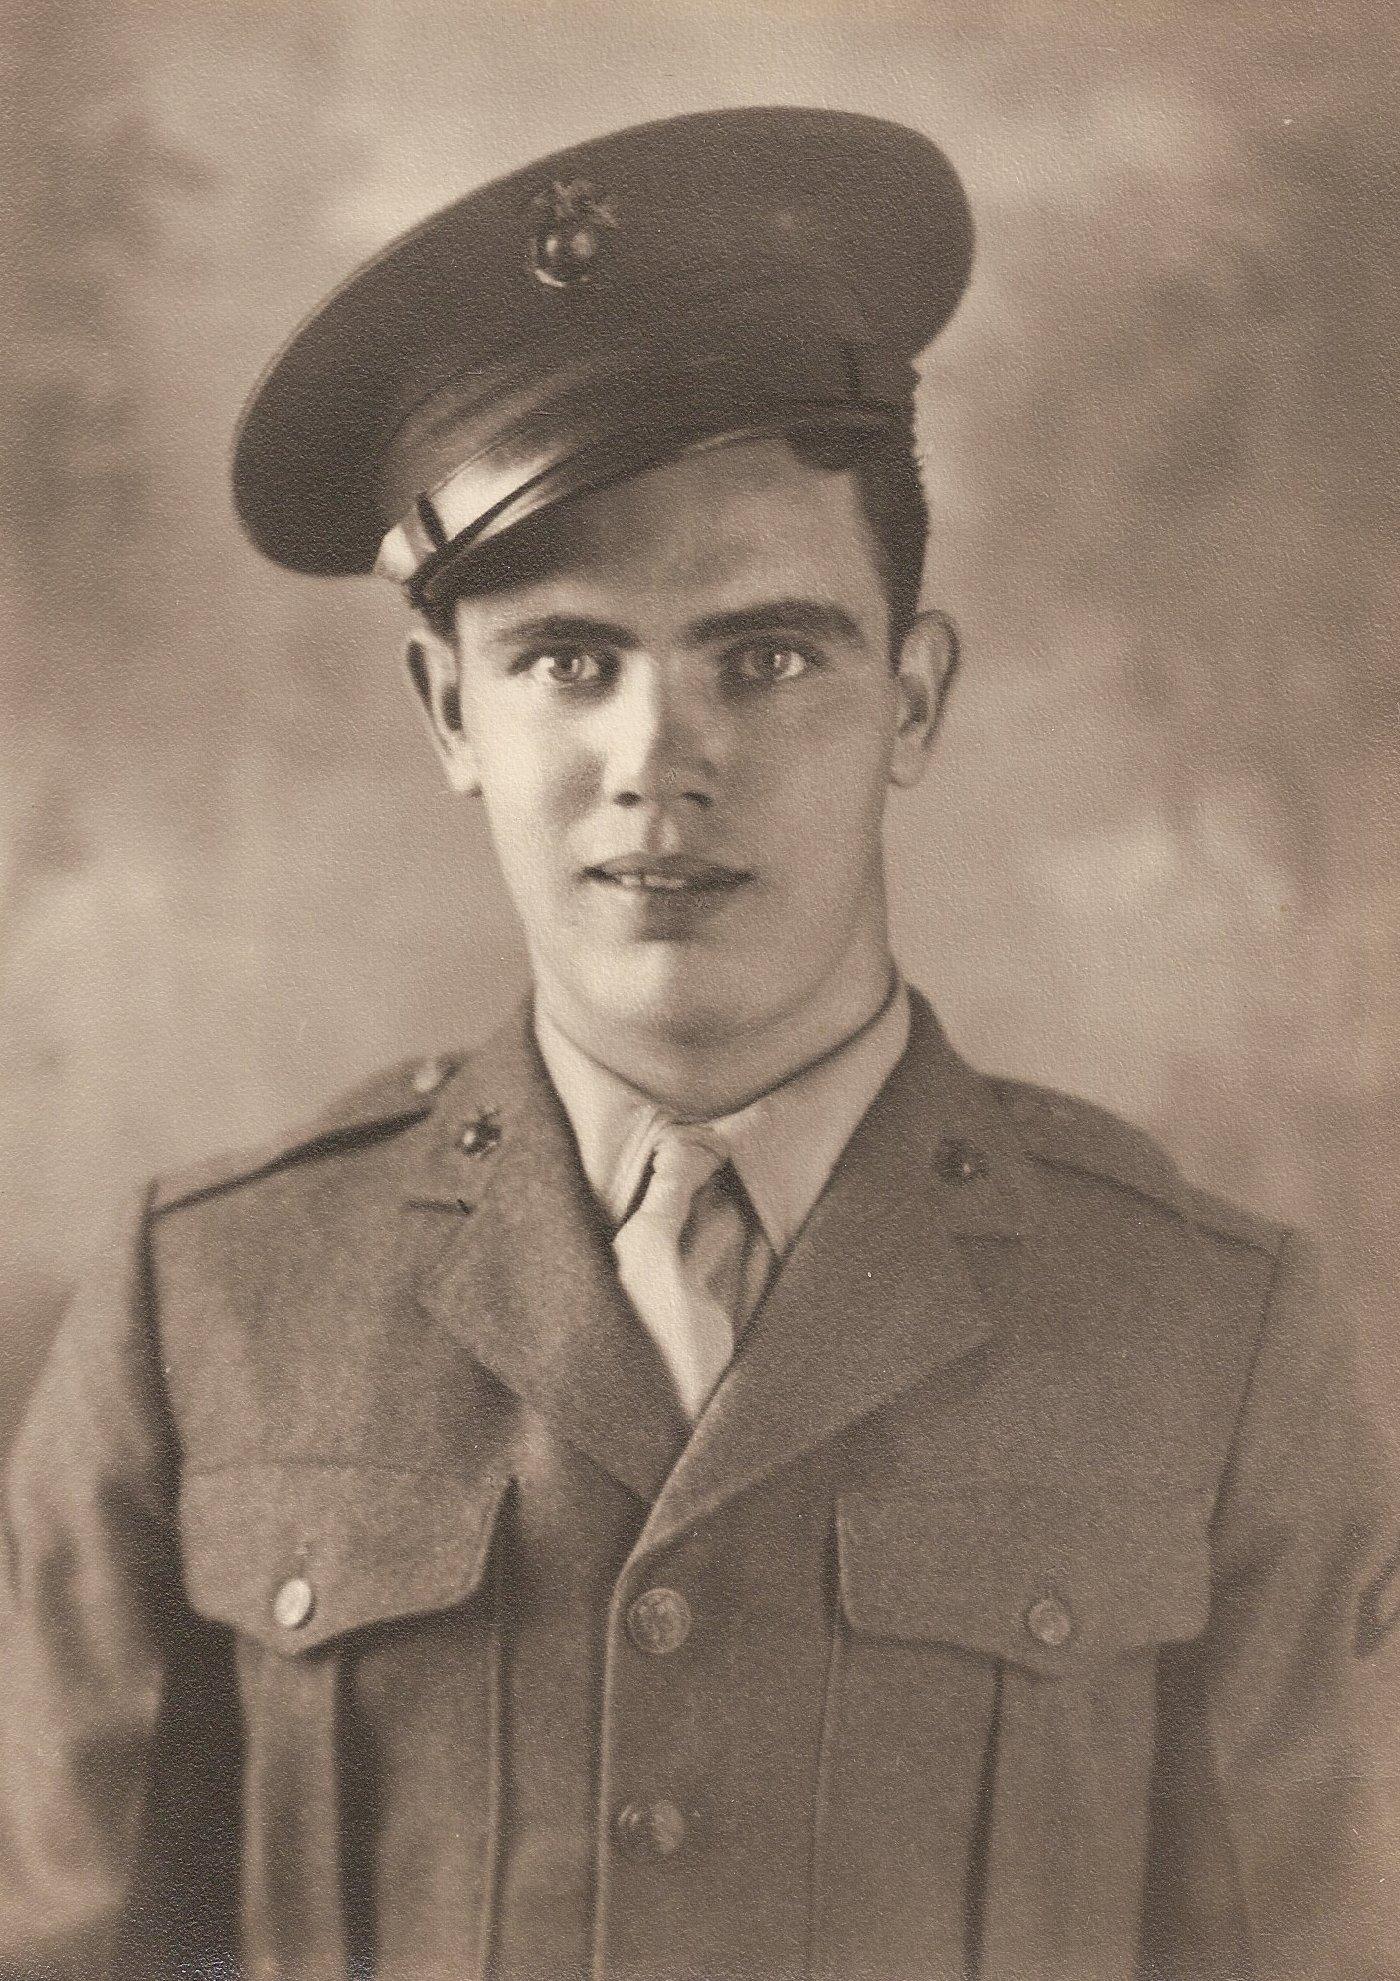 1943 US Marine-WWII Veteran